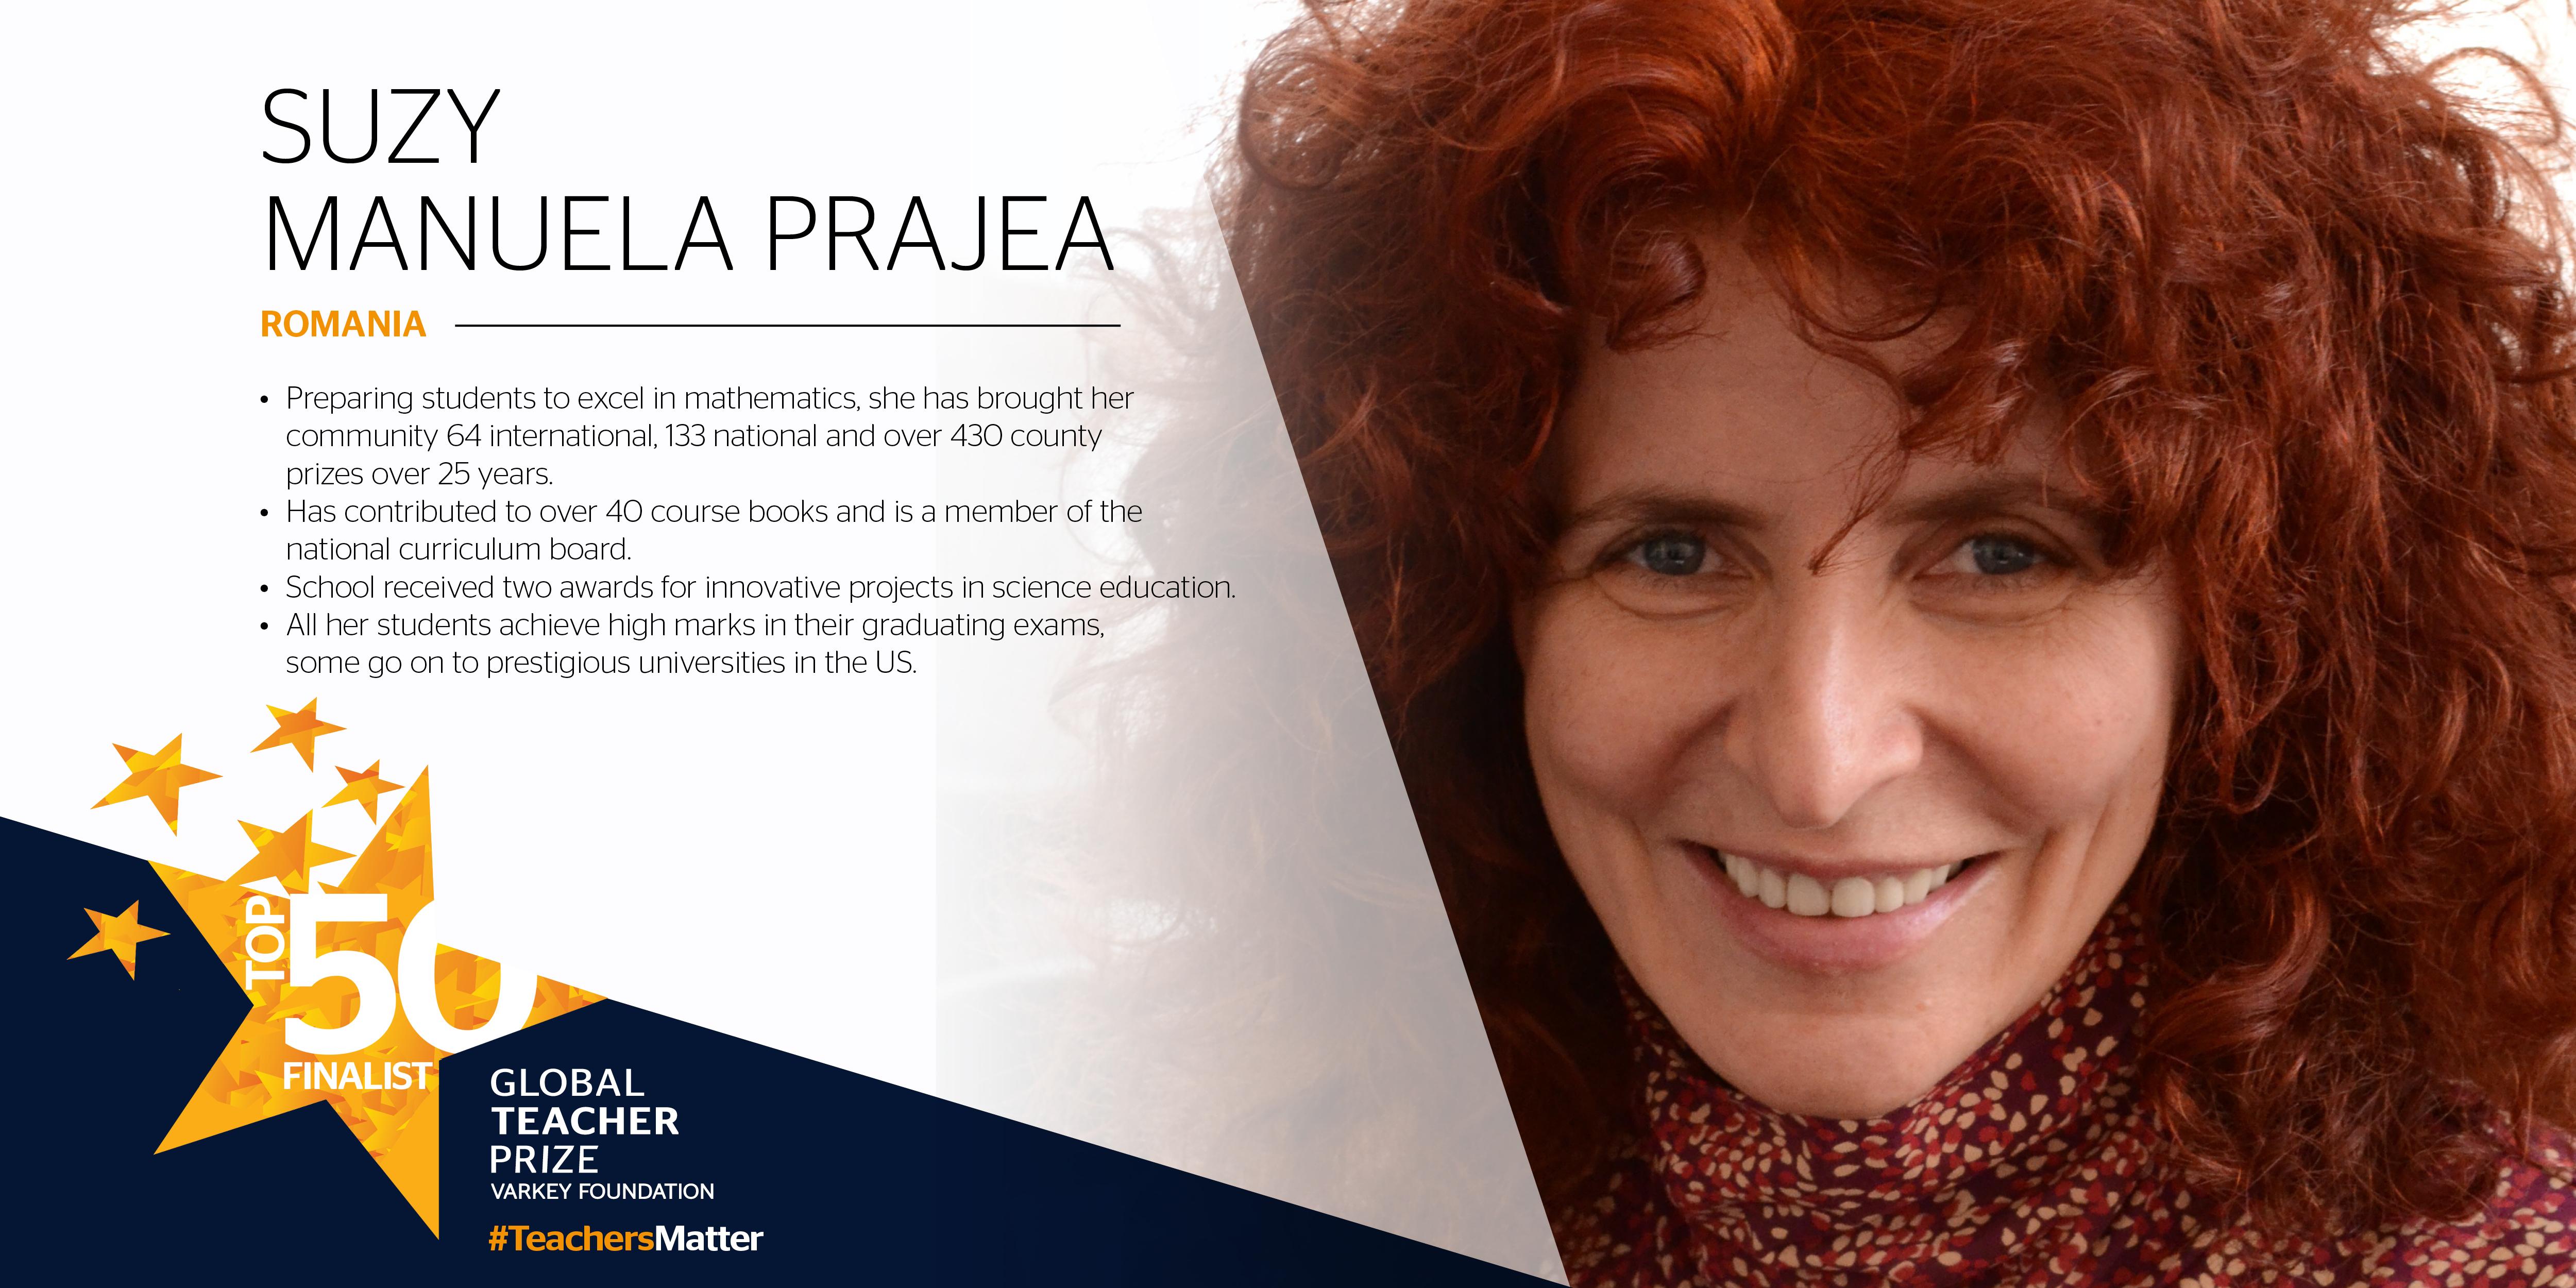 Suzy-Manuela-Prajea-Social-Graphic